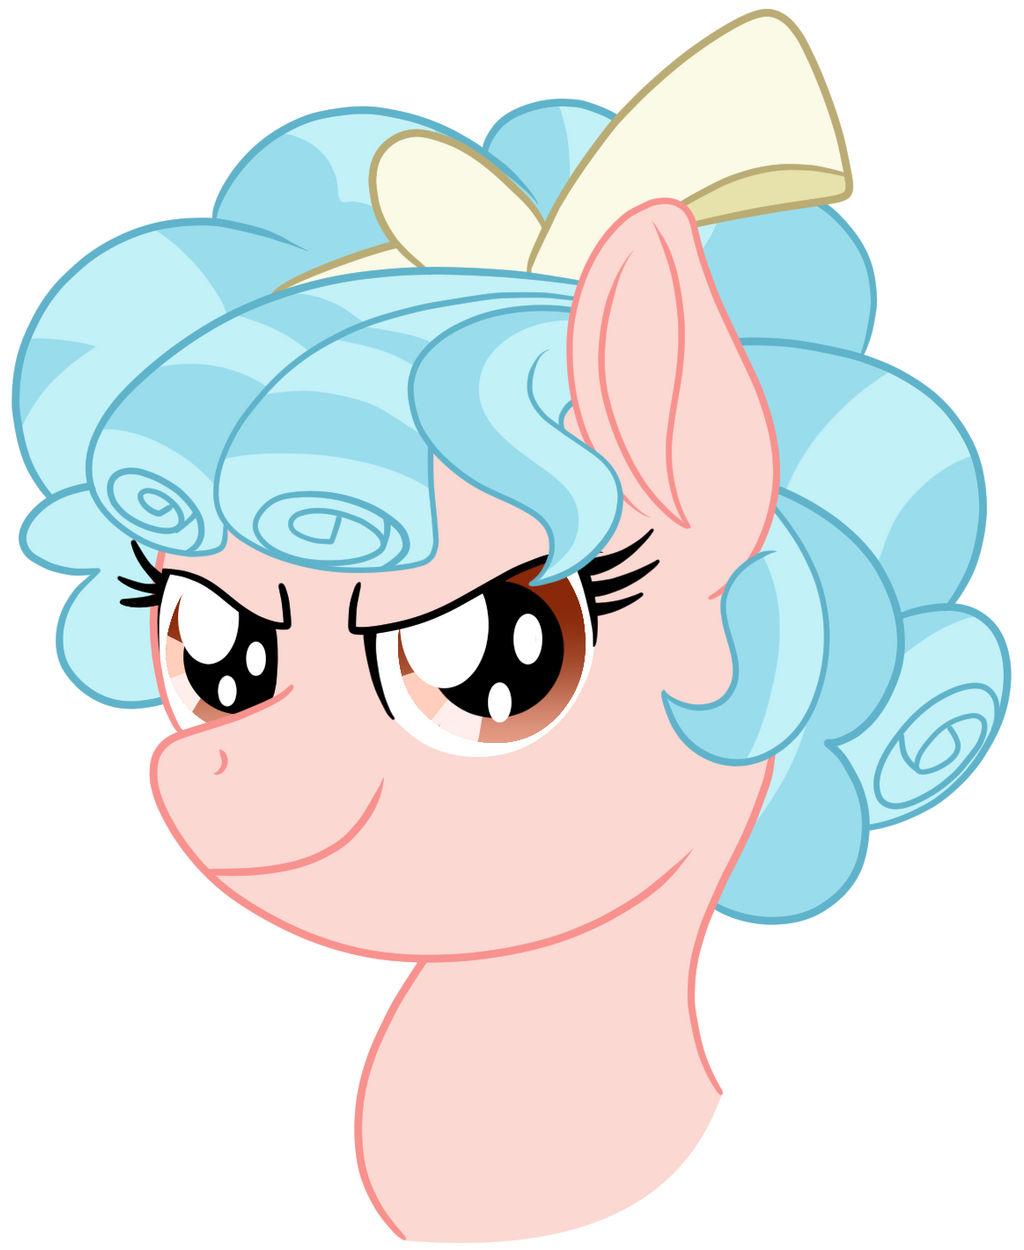 Evil Shirley Temple Pony